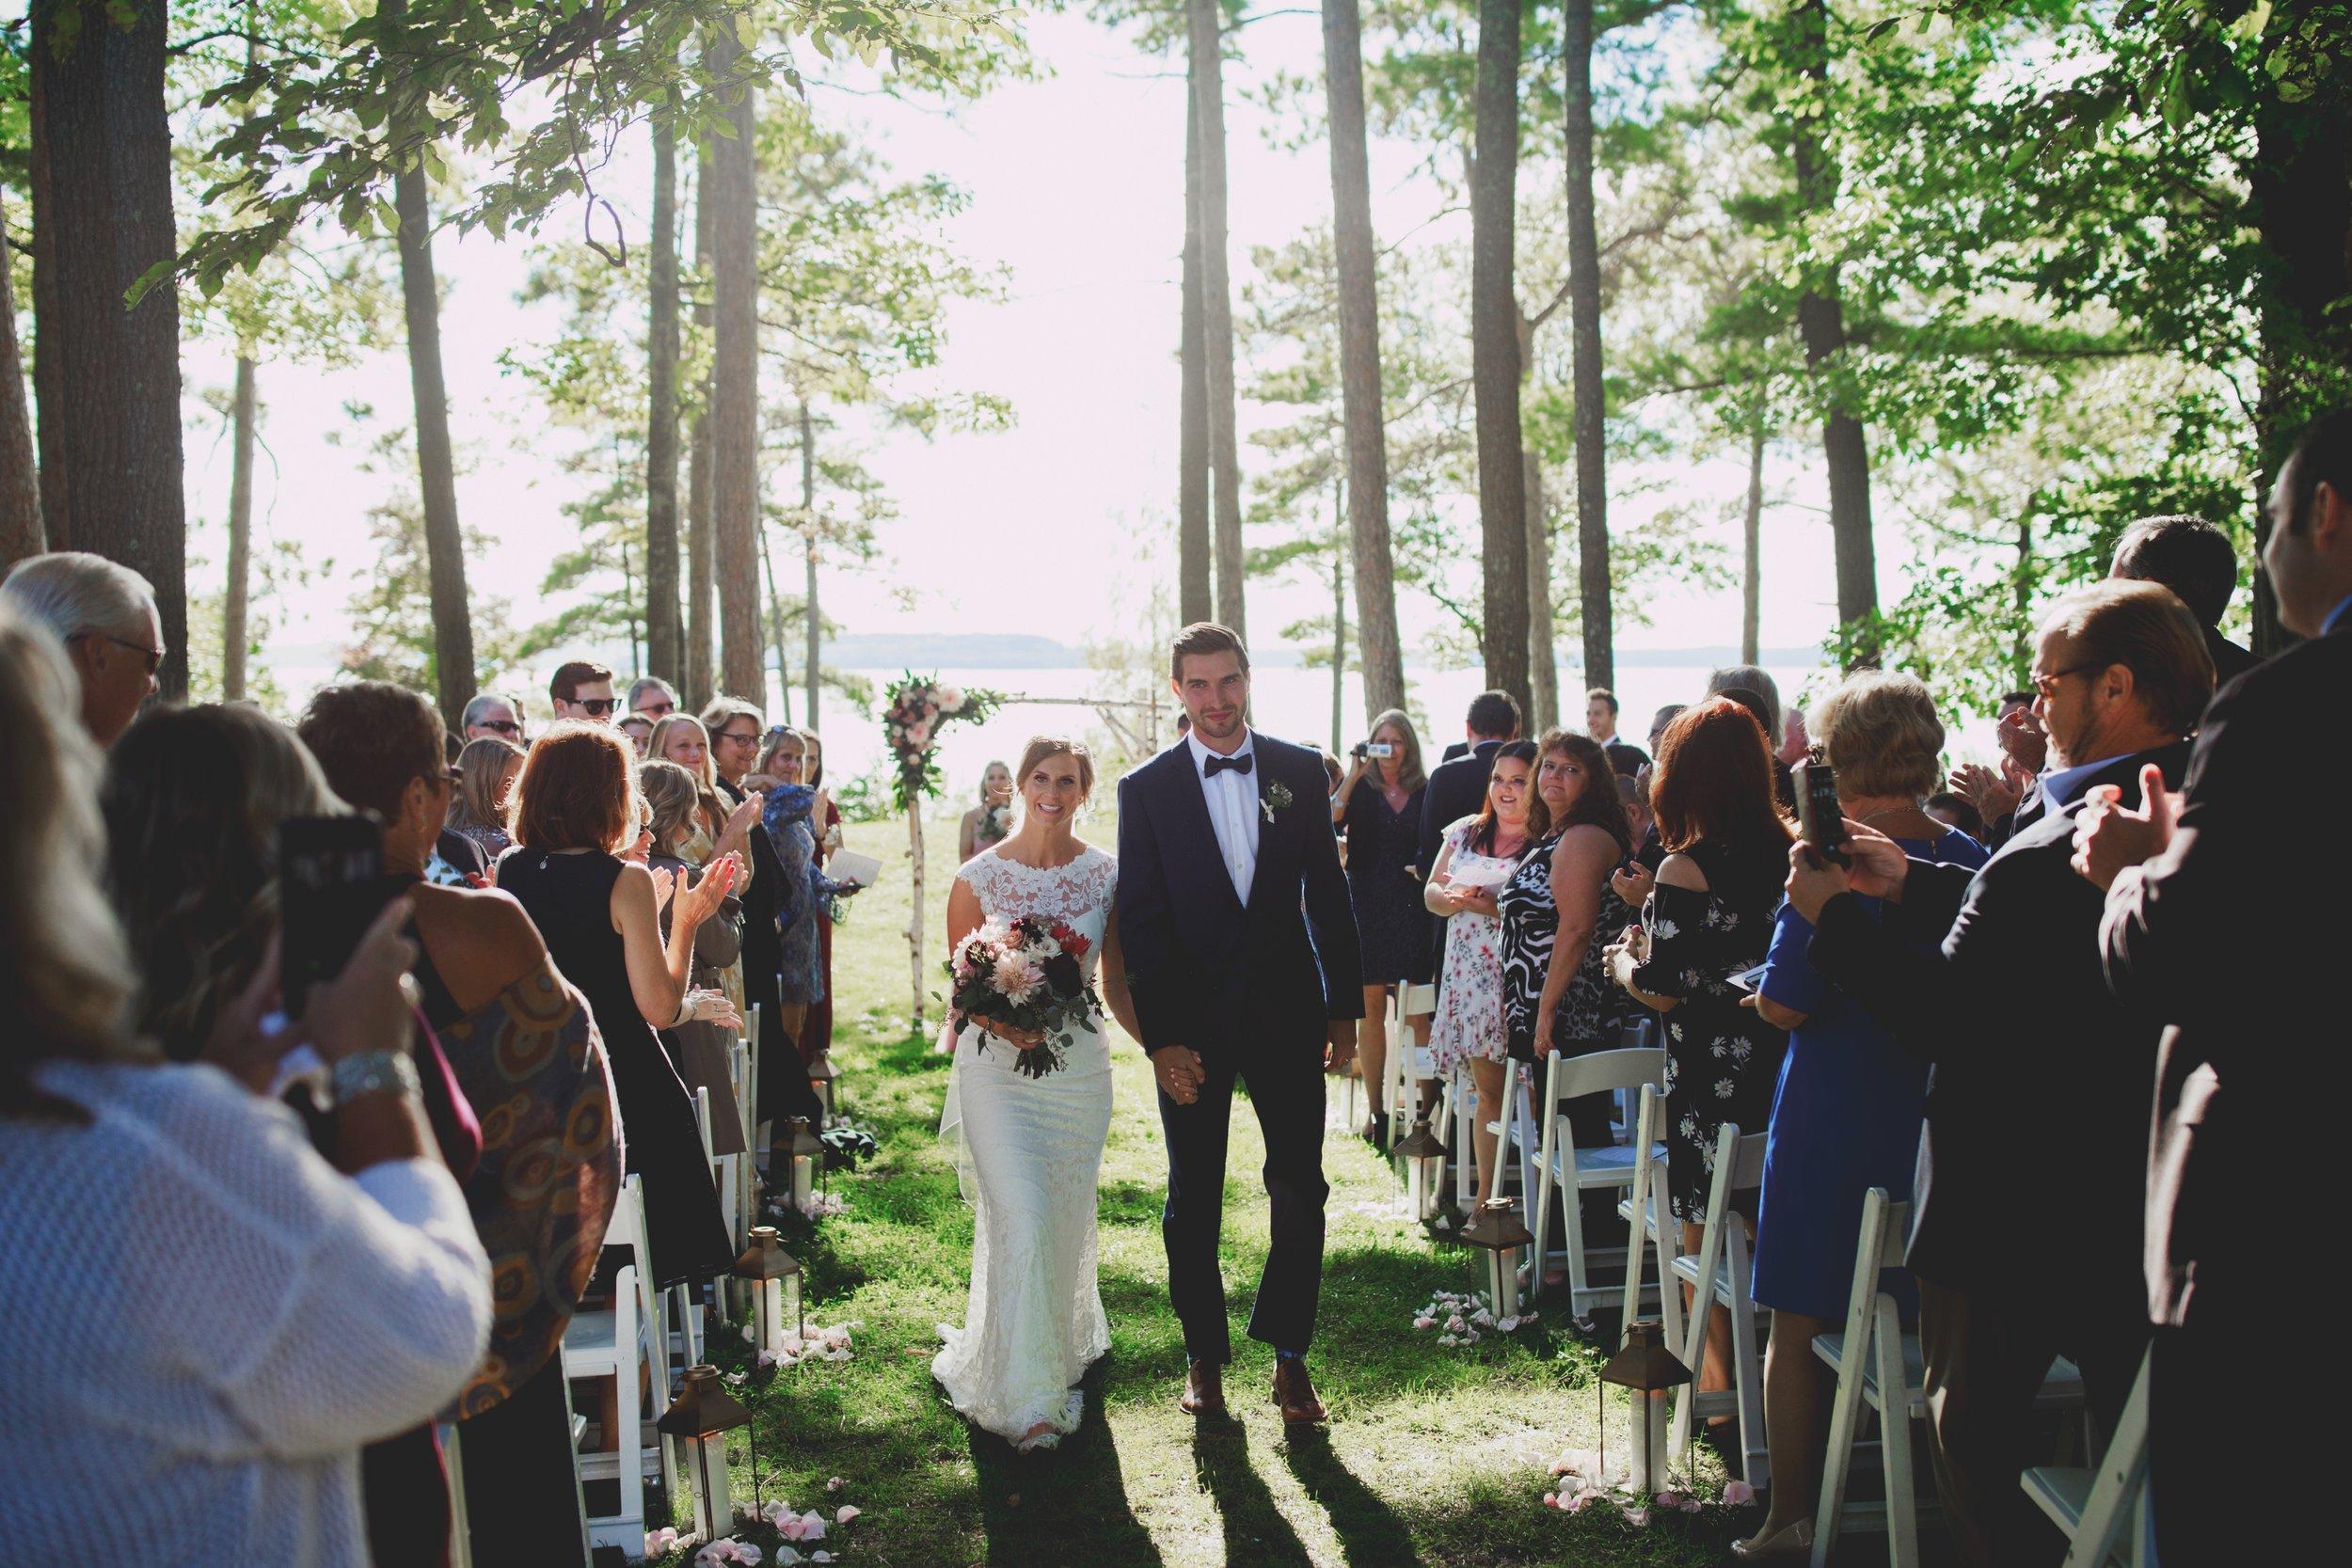 traverse_city_wedding_067.jpg